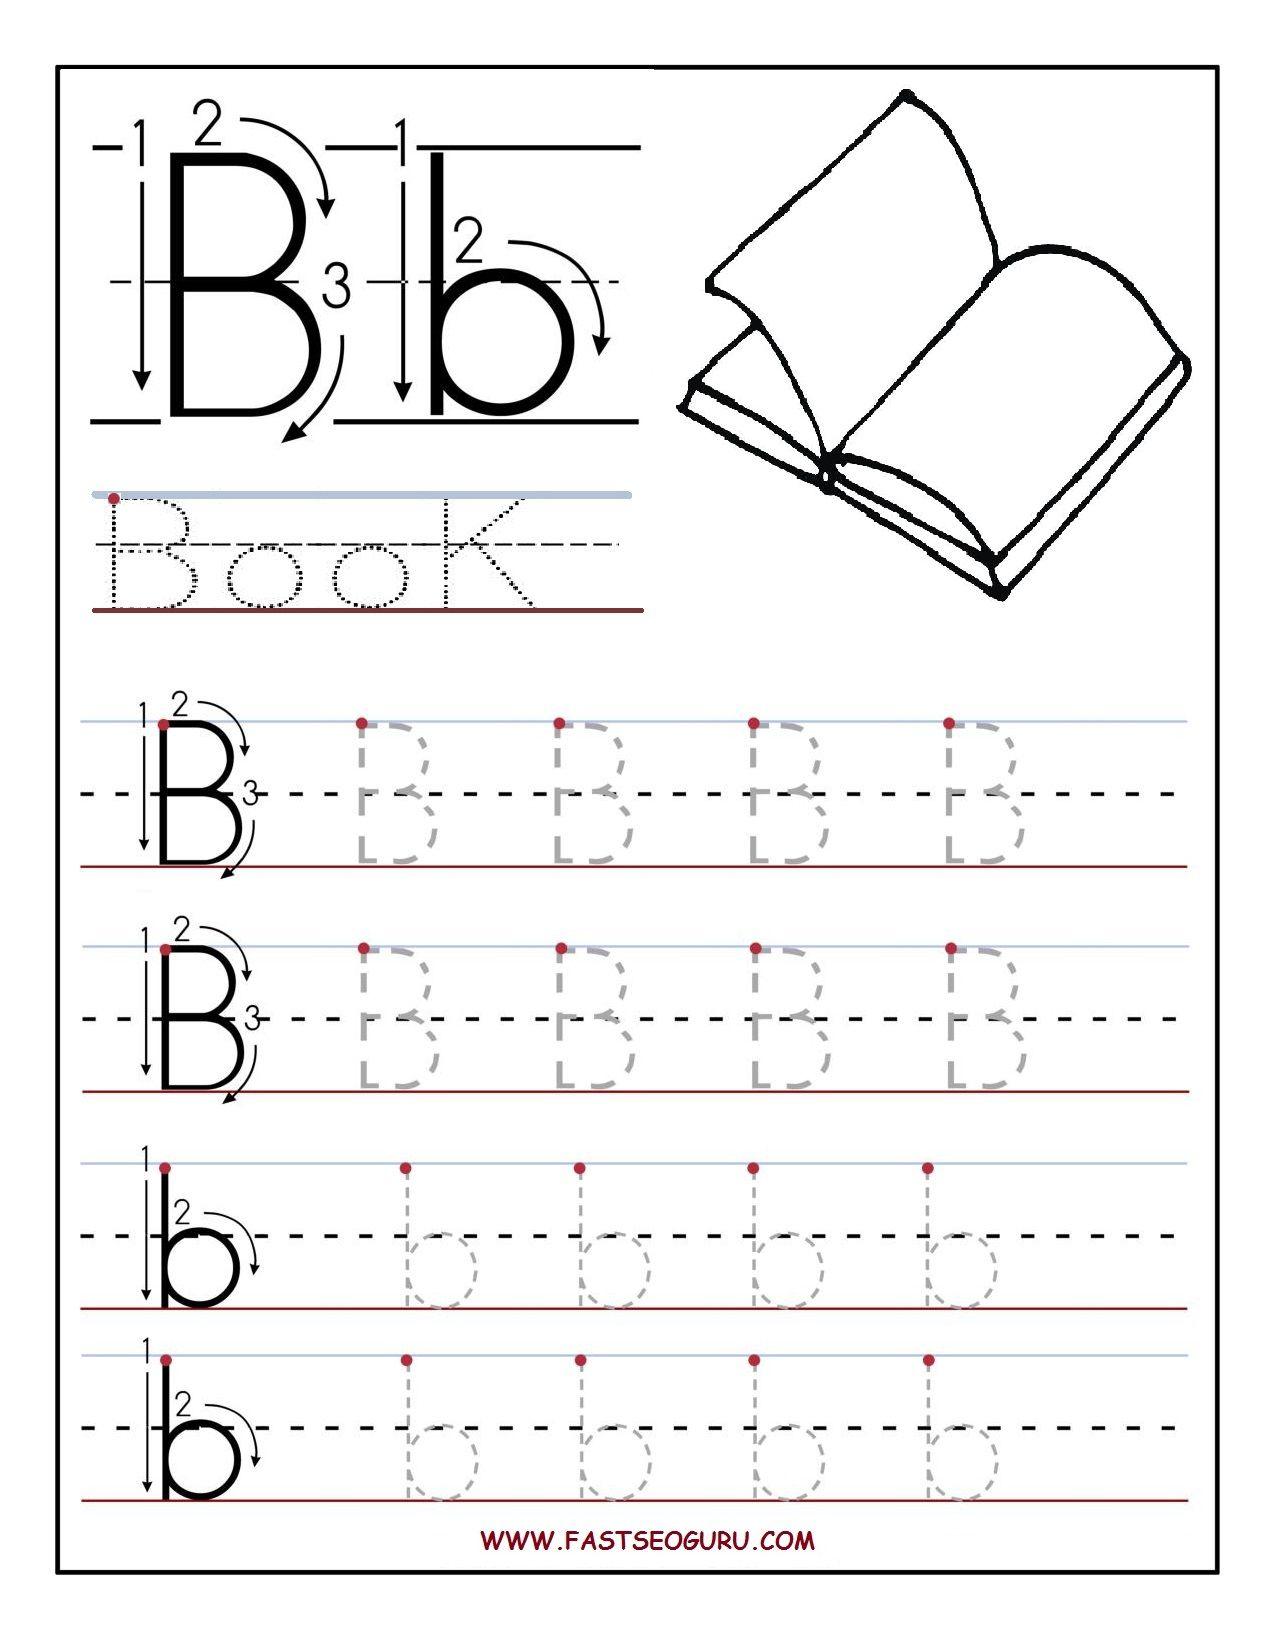 Printable Letter B Tracing Worksheets For Preschool regarding Alphabet Worksheets Letter B